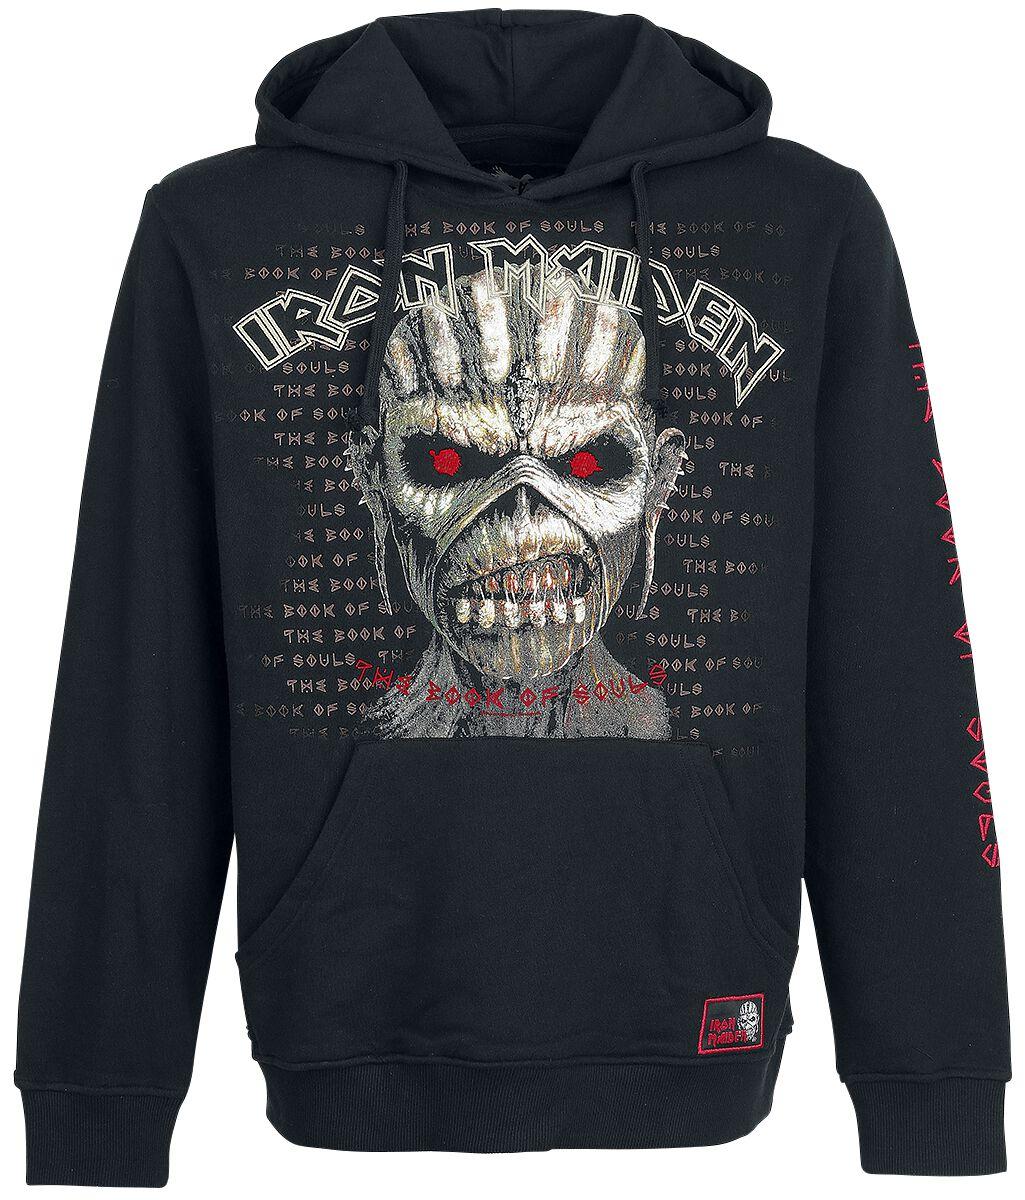 Marka własna - Bluzy z kapturem - Bluza z kapturem Iron Maiden EMP Signature Collection Bluza z kapturem czarny - 332721